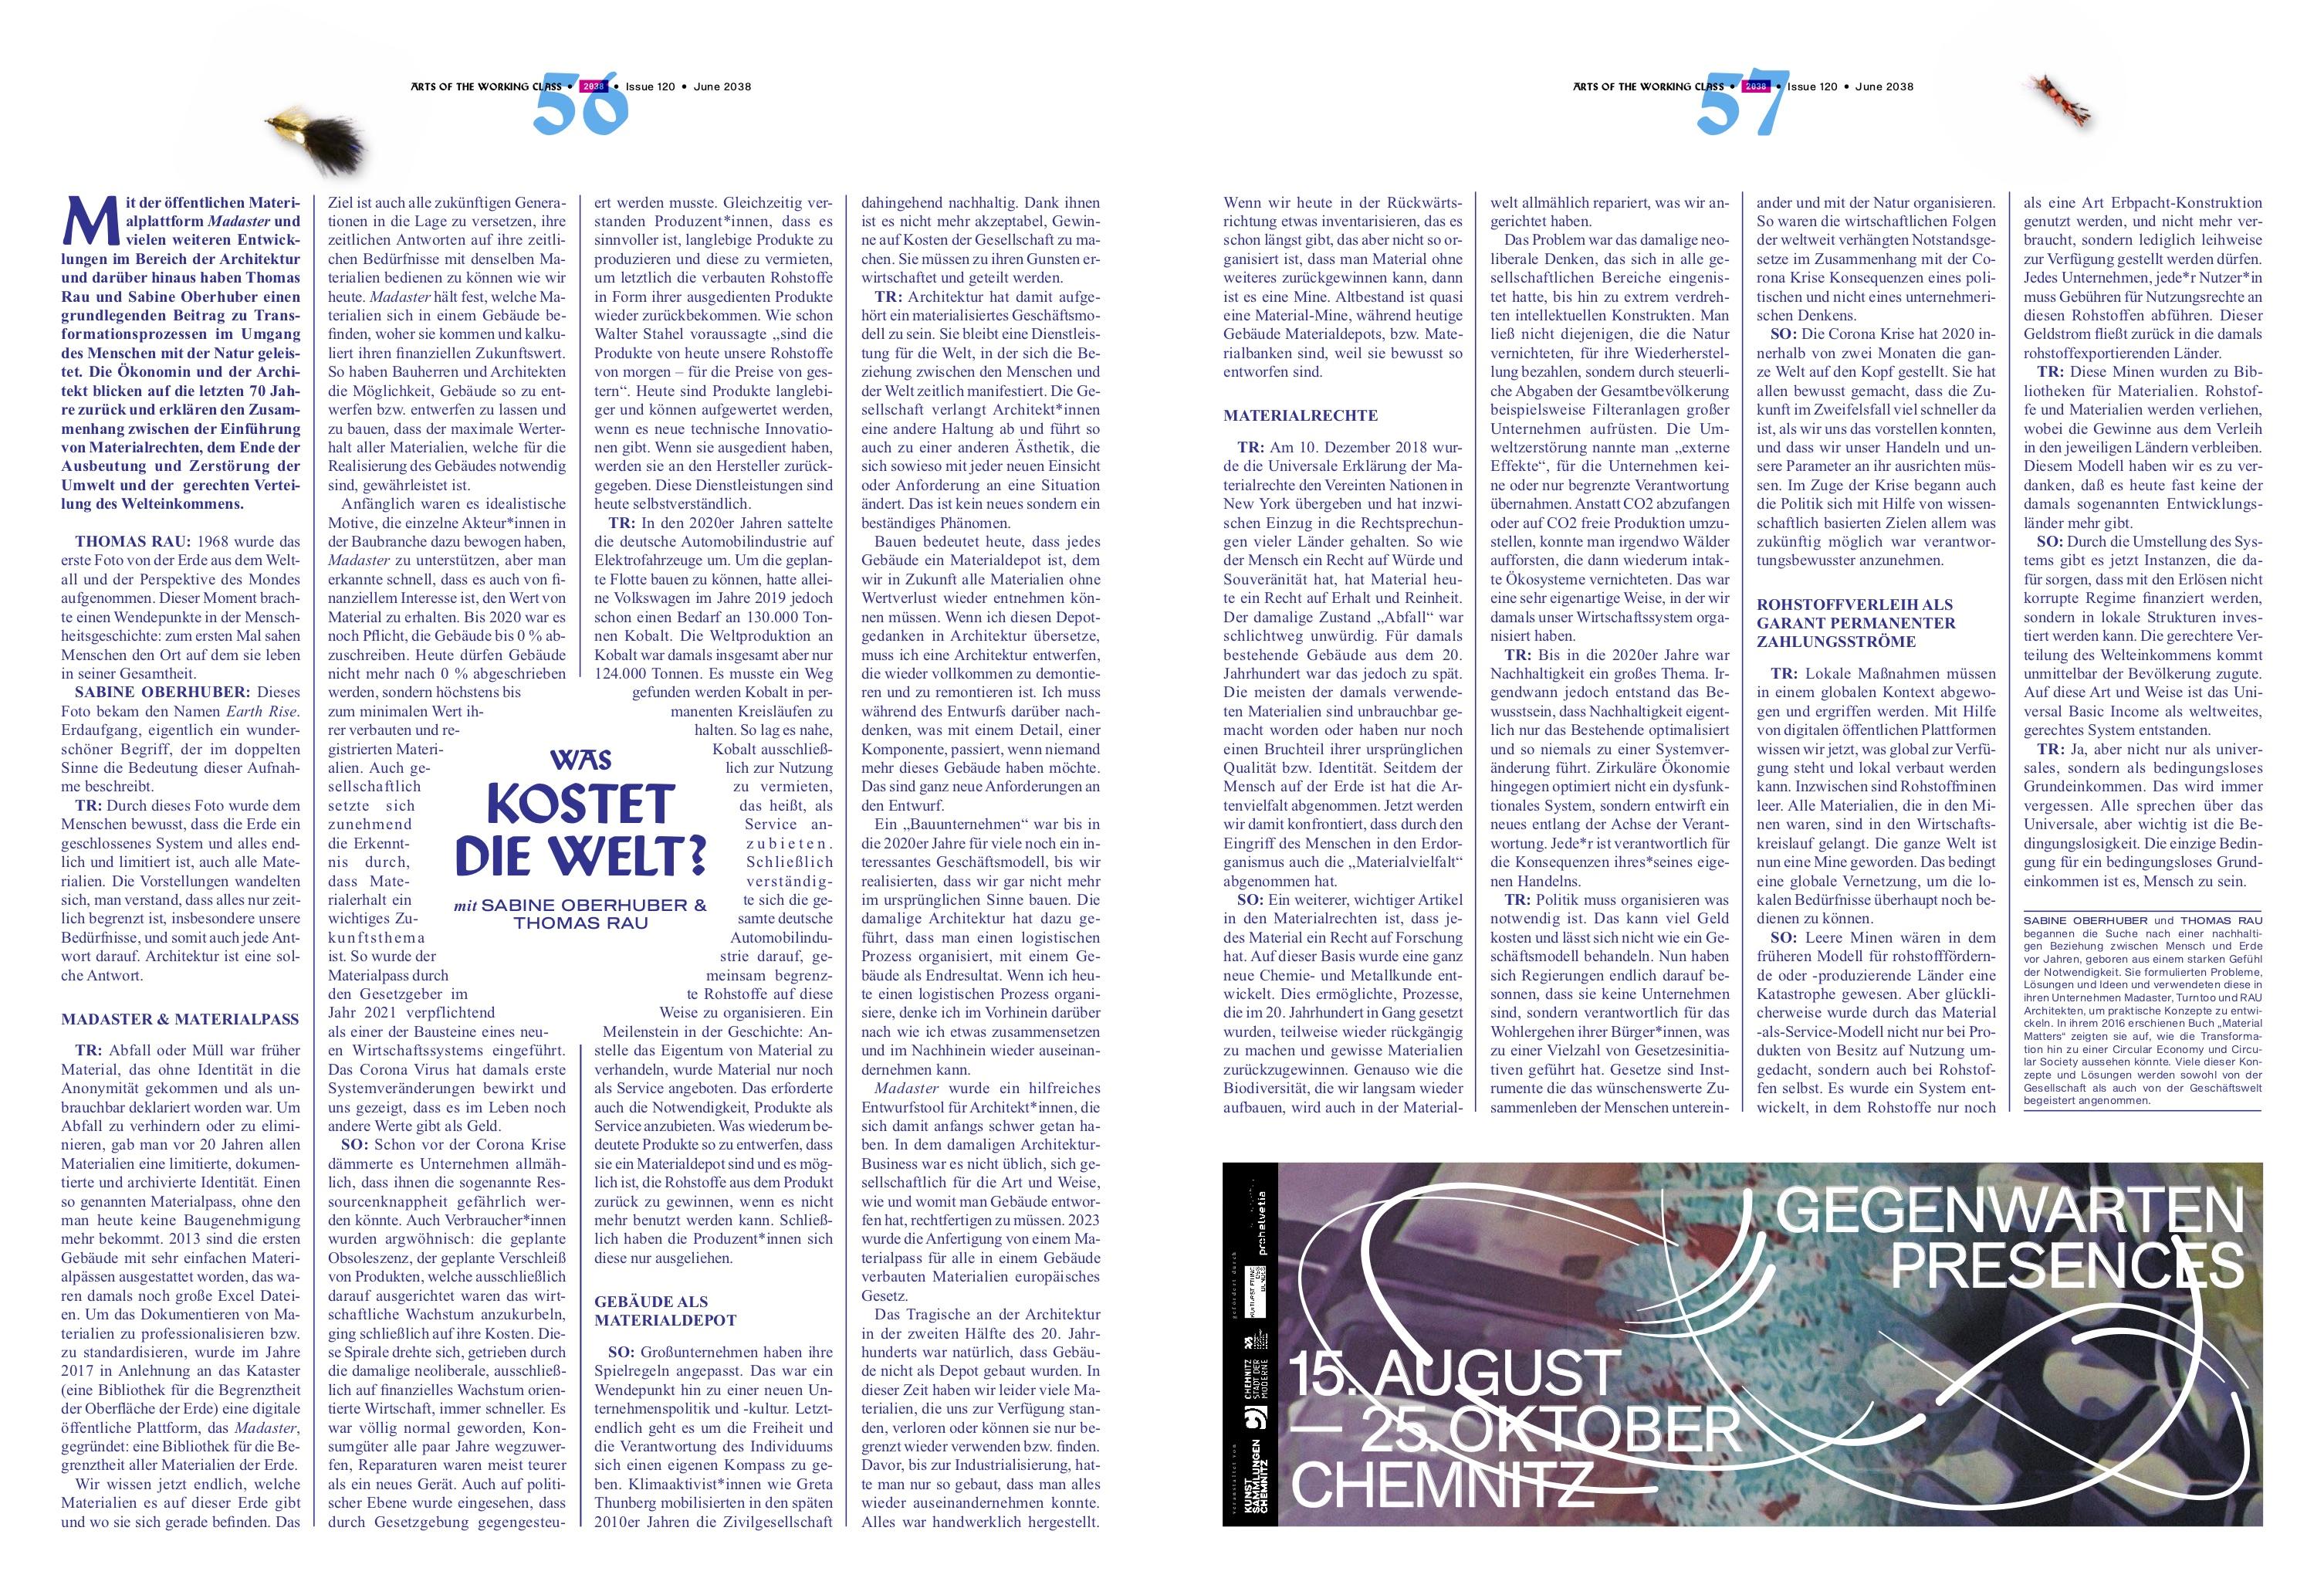 2038xAWC_Material Matters_by Sabine Oberhuber and Thomas Rau